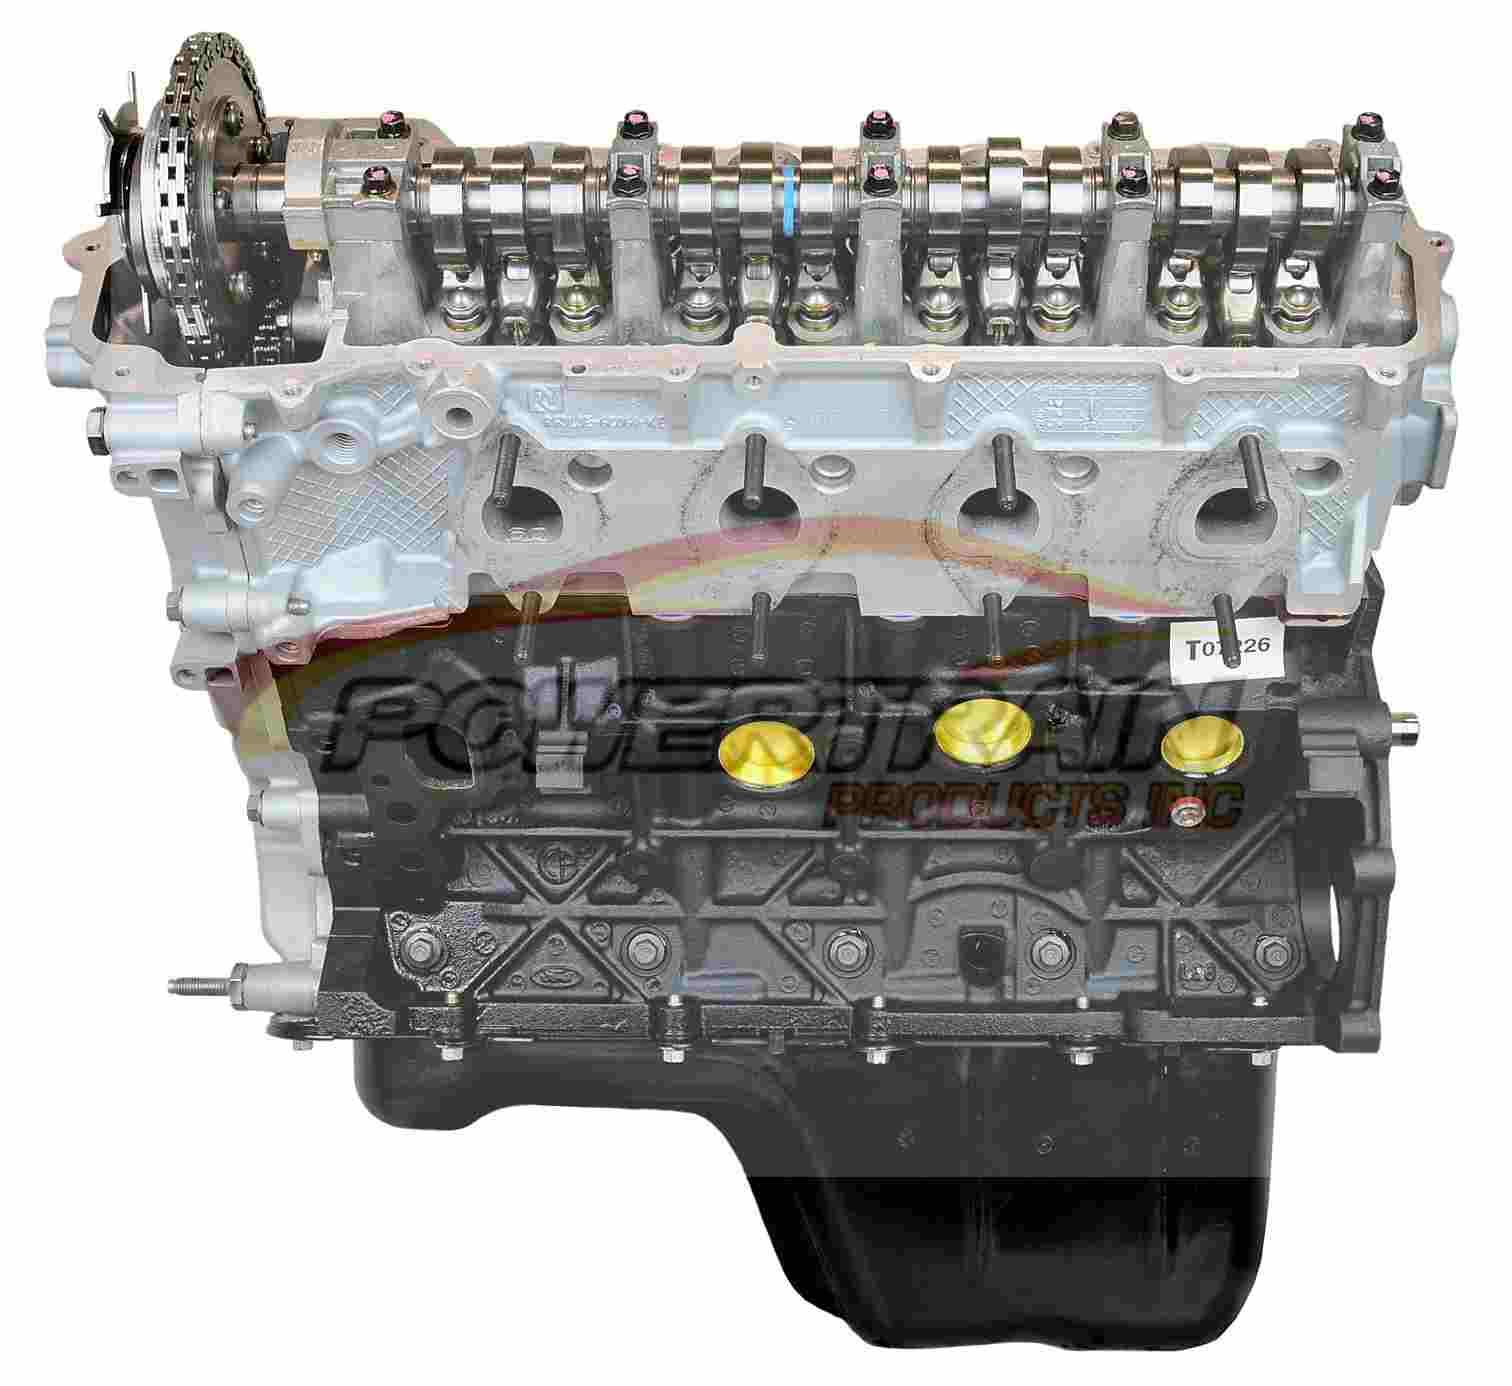 Ford F150 54 Engine - Greatest Ford